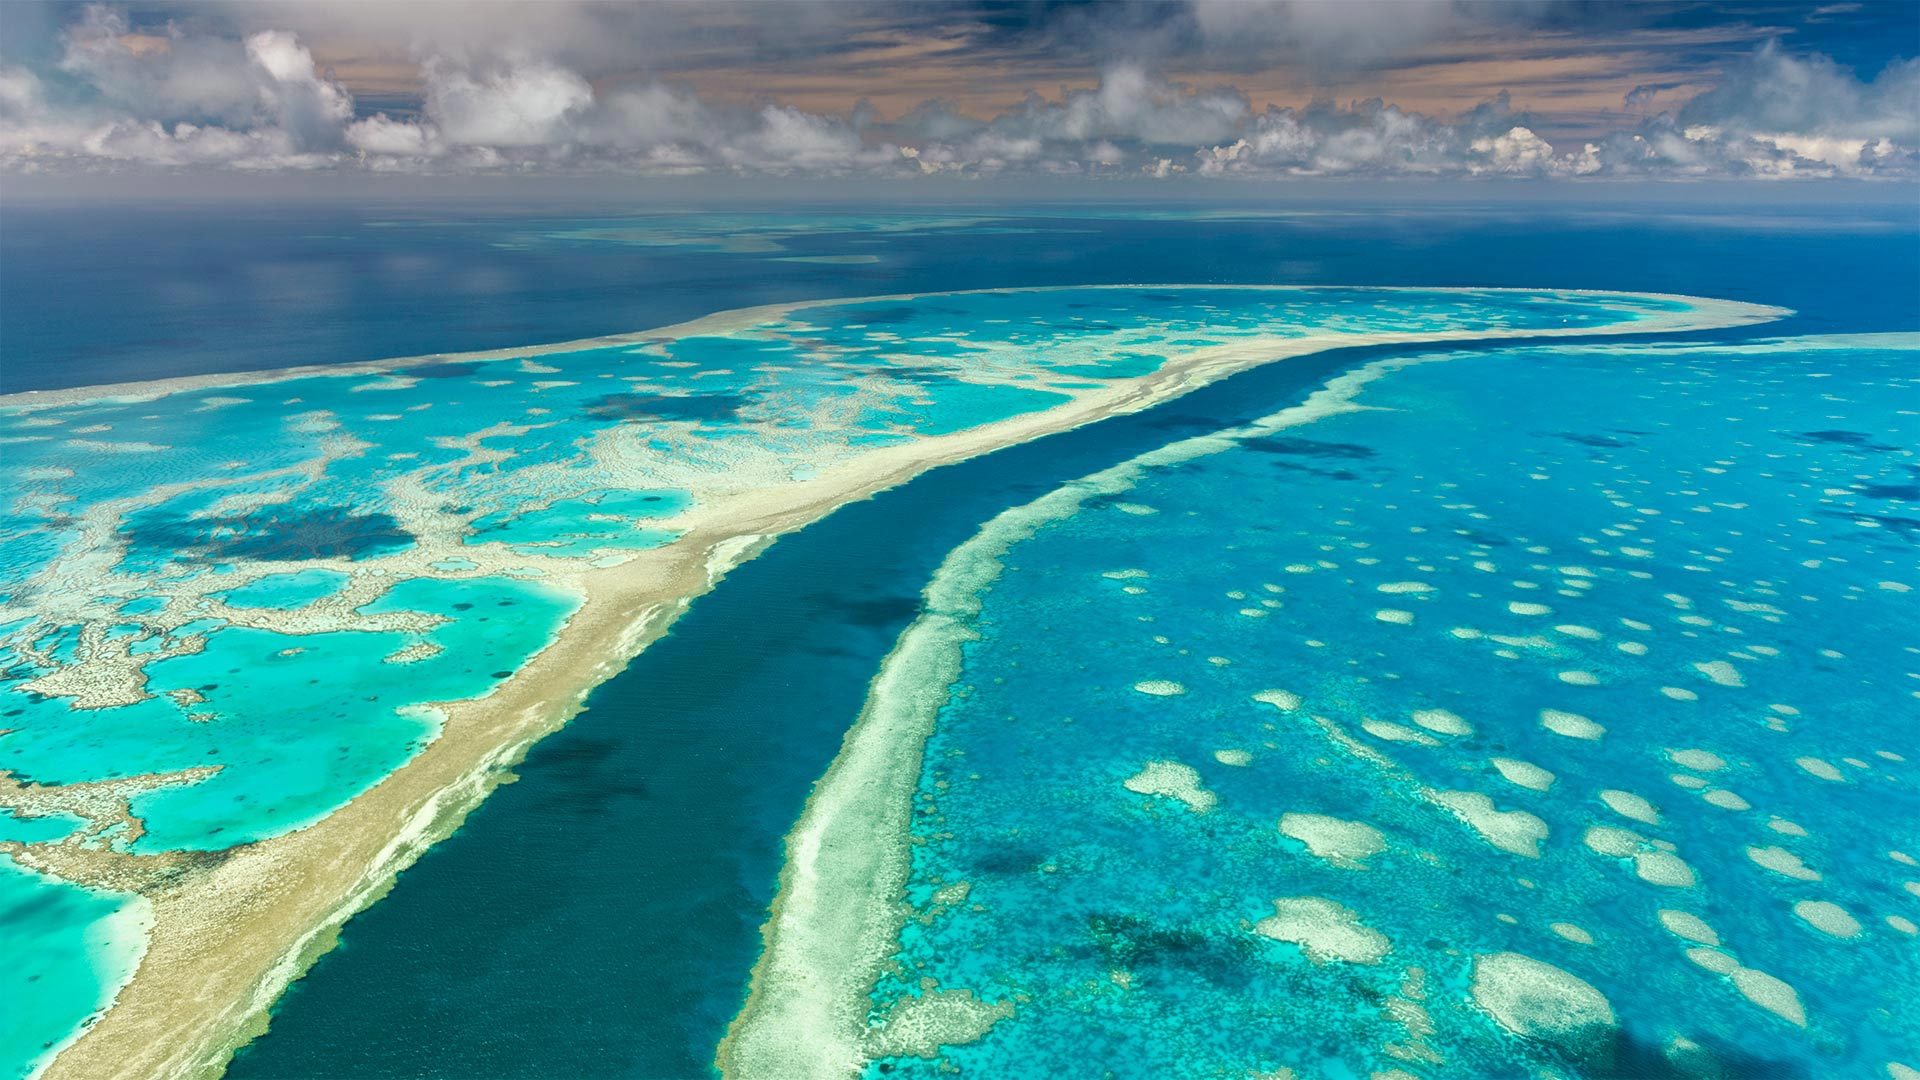 Great Barrier Reef, Queensland, Australia (© AWL Images/Danita Delimont)(Bing United States)